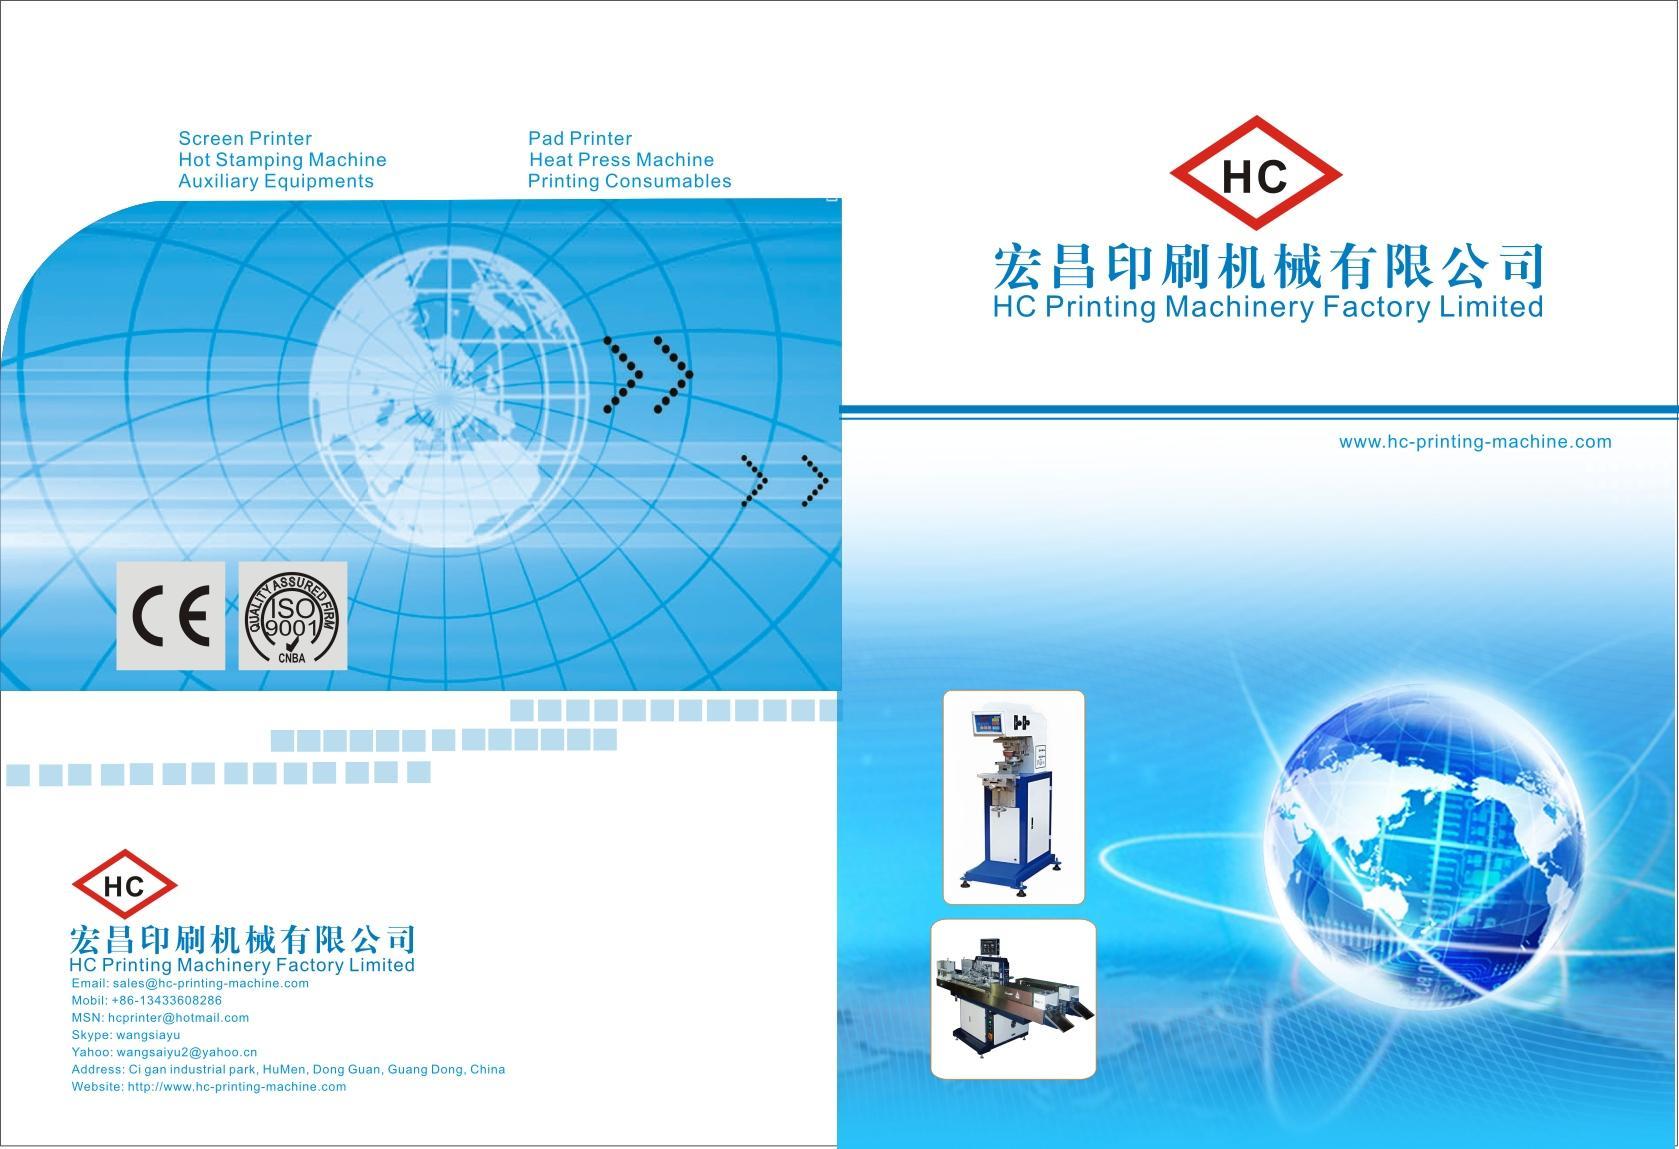 screen printer, pad printer, hot stamp machine, heat transfer machine, sublimat 1